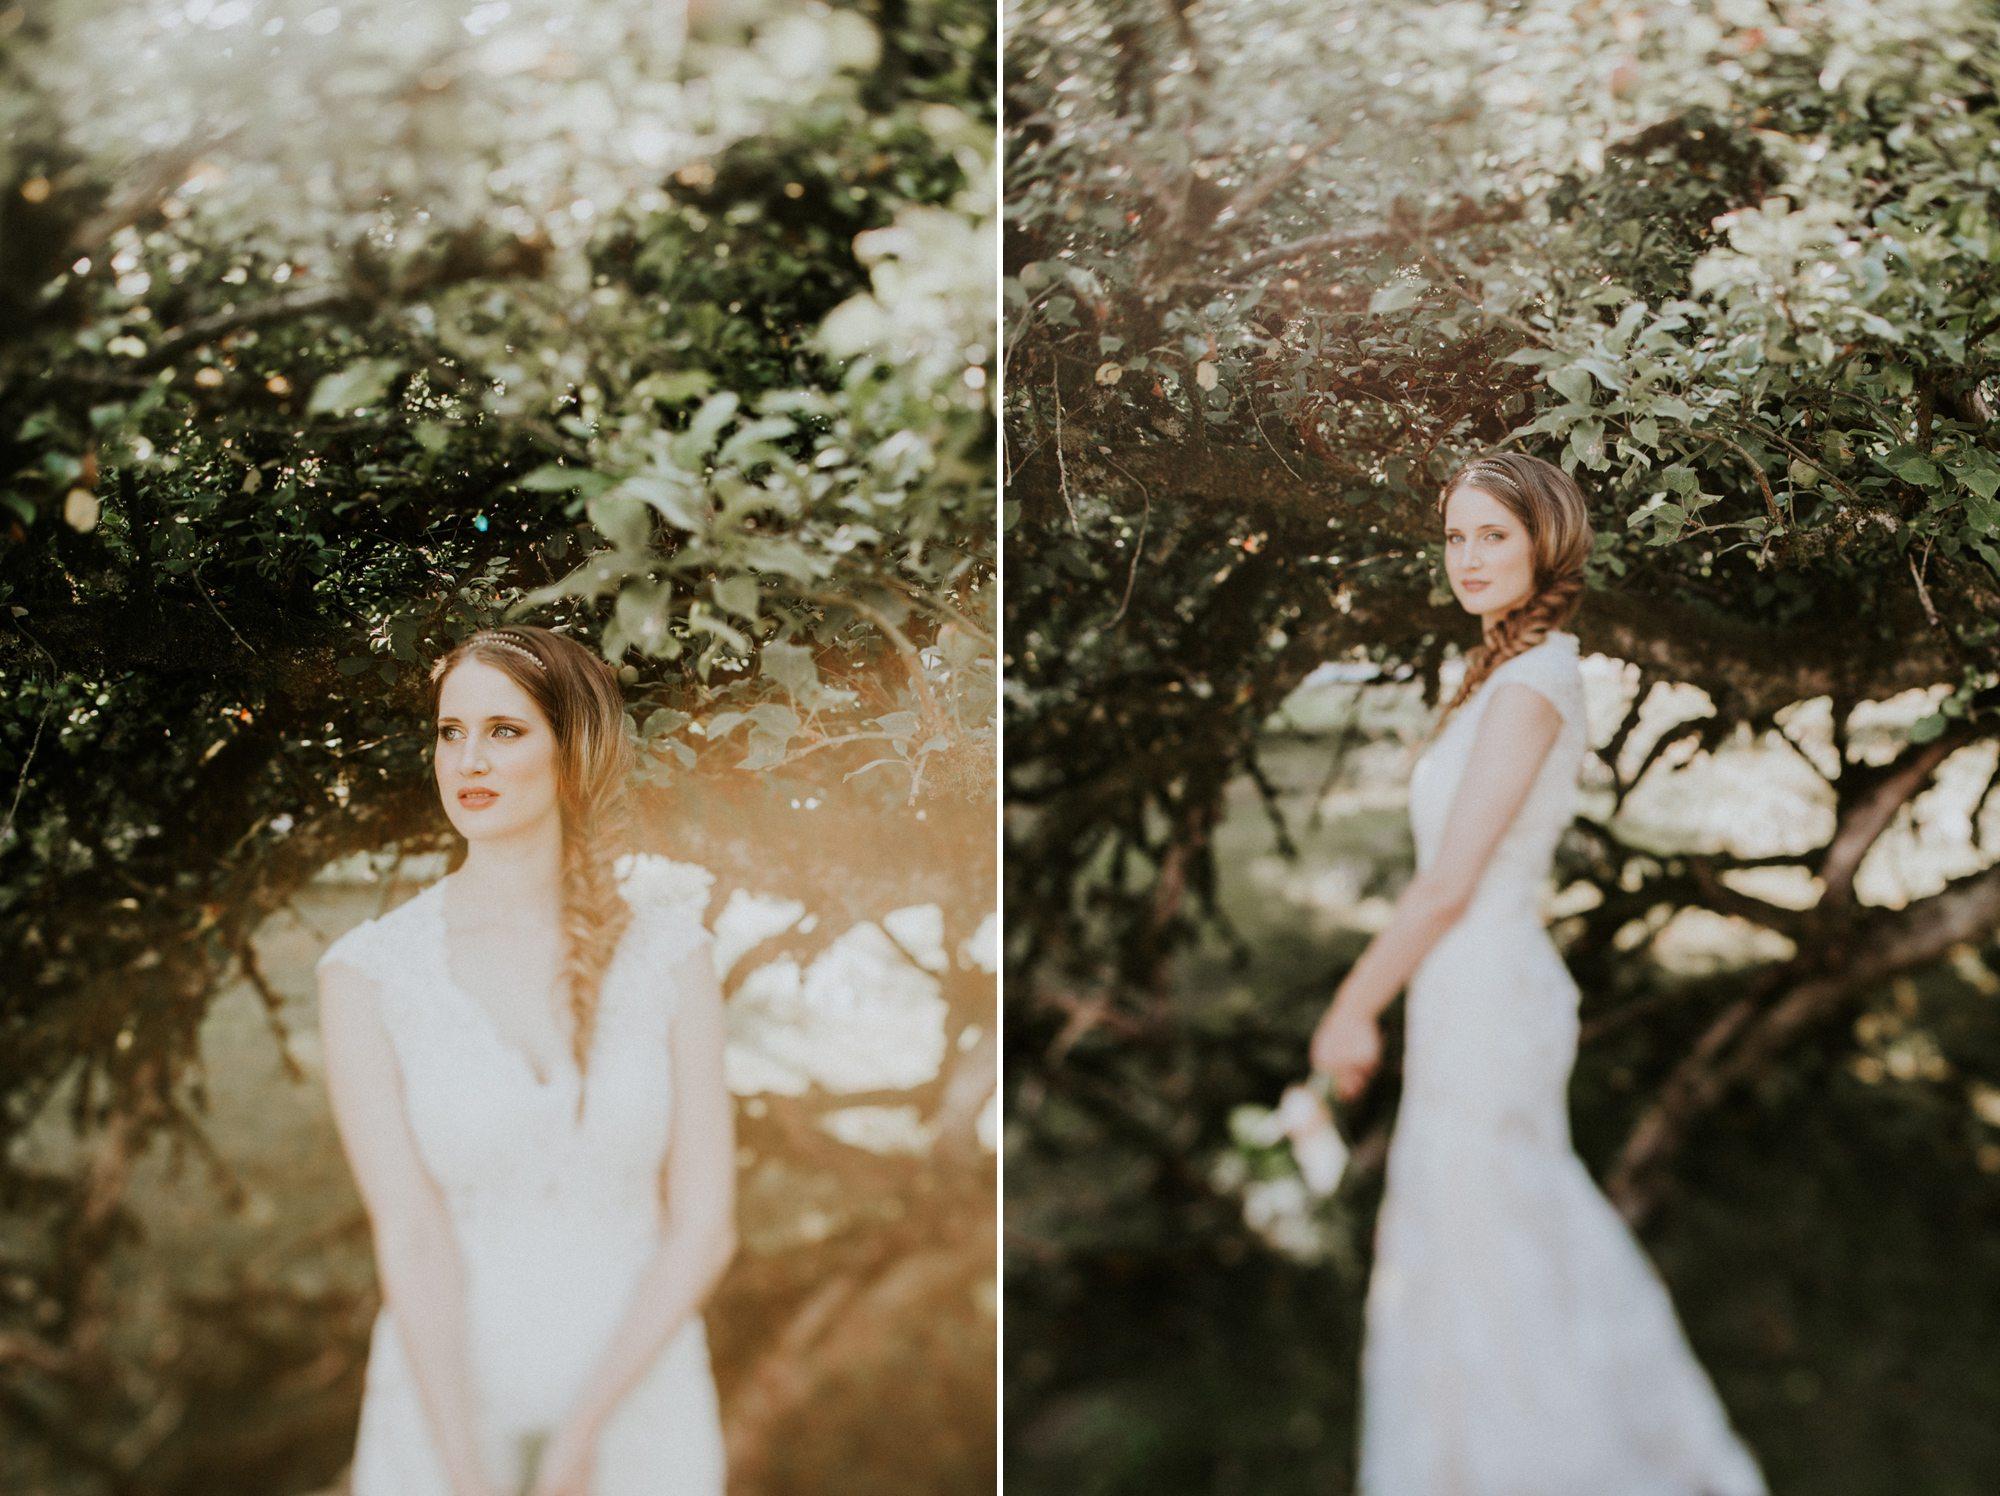 879-abbotsford-wedding-photographer